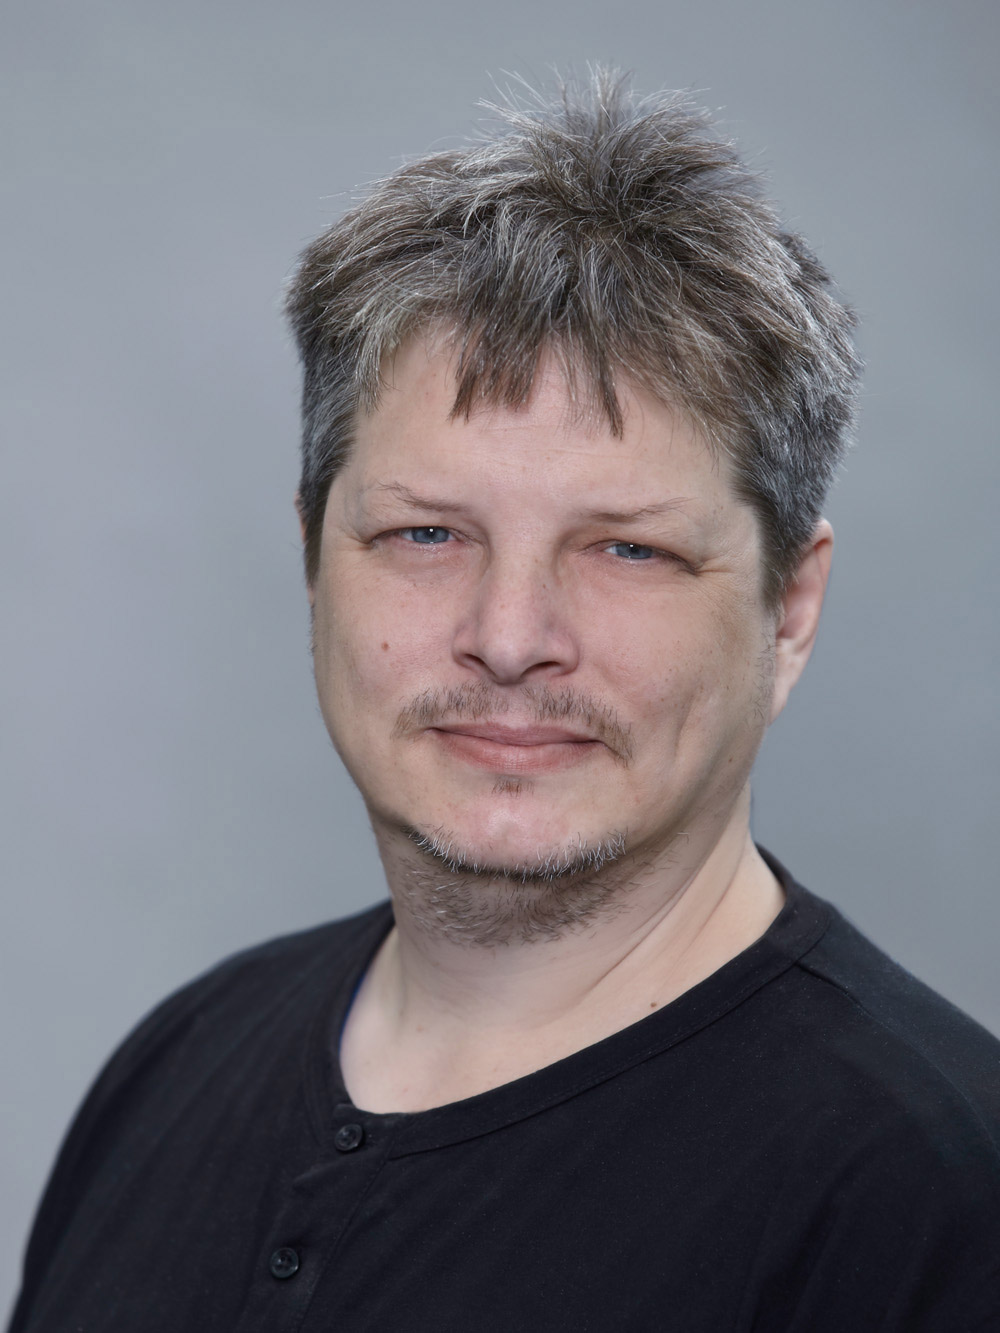 Arne Strohmann